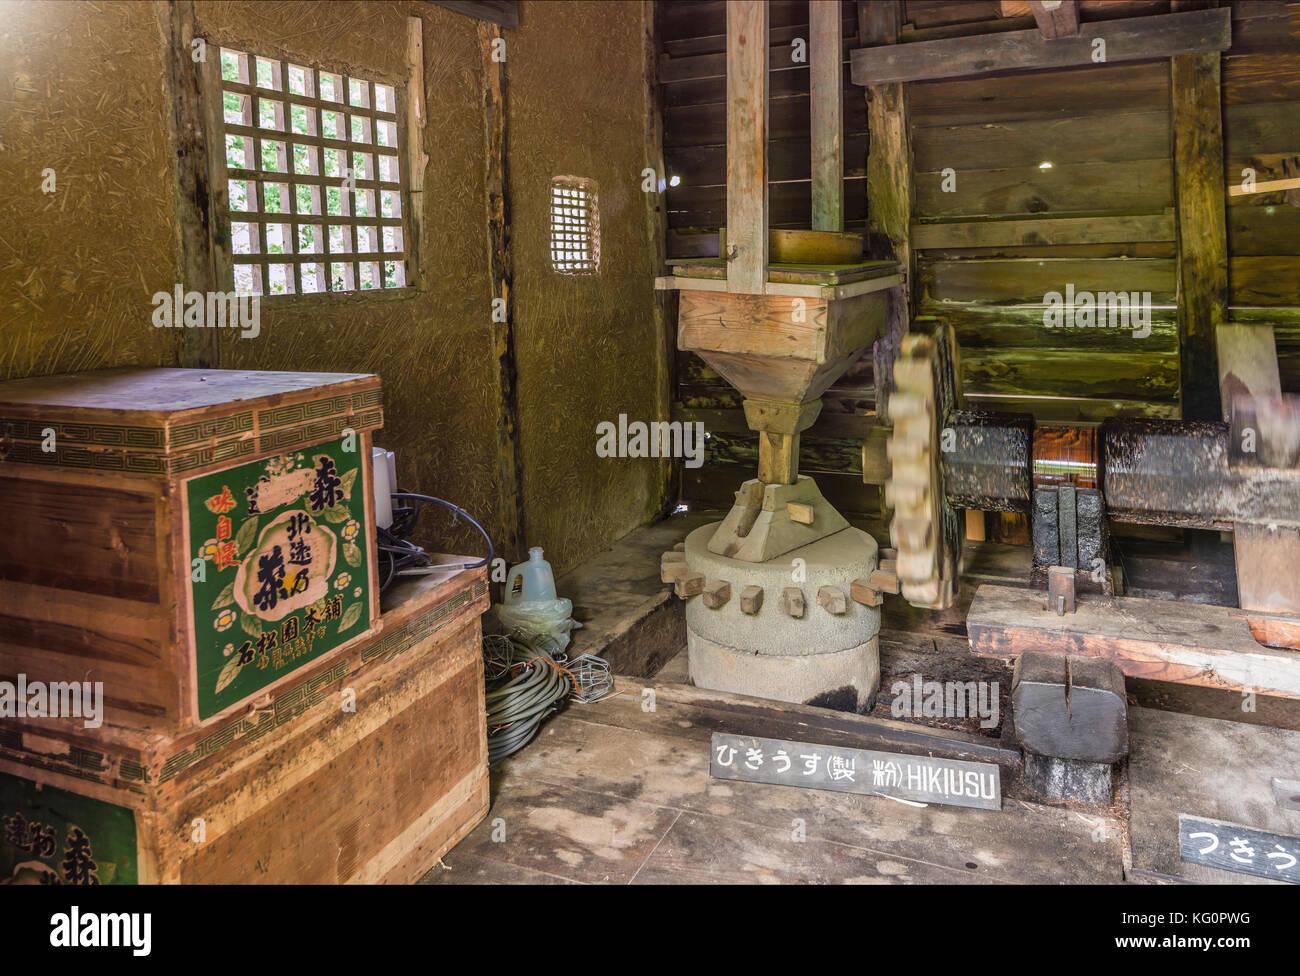 Ancient Japanese Water Mill at Nihon Minkaen Folk House Museum, Kawasaki City, Kanagawa, Japan - Stock Image